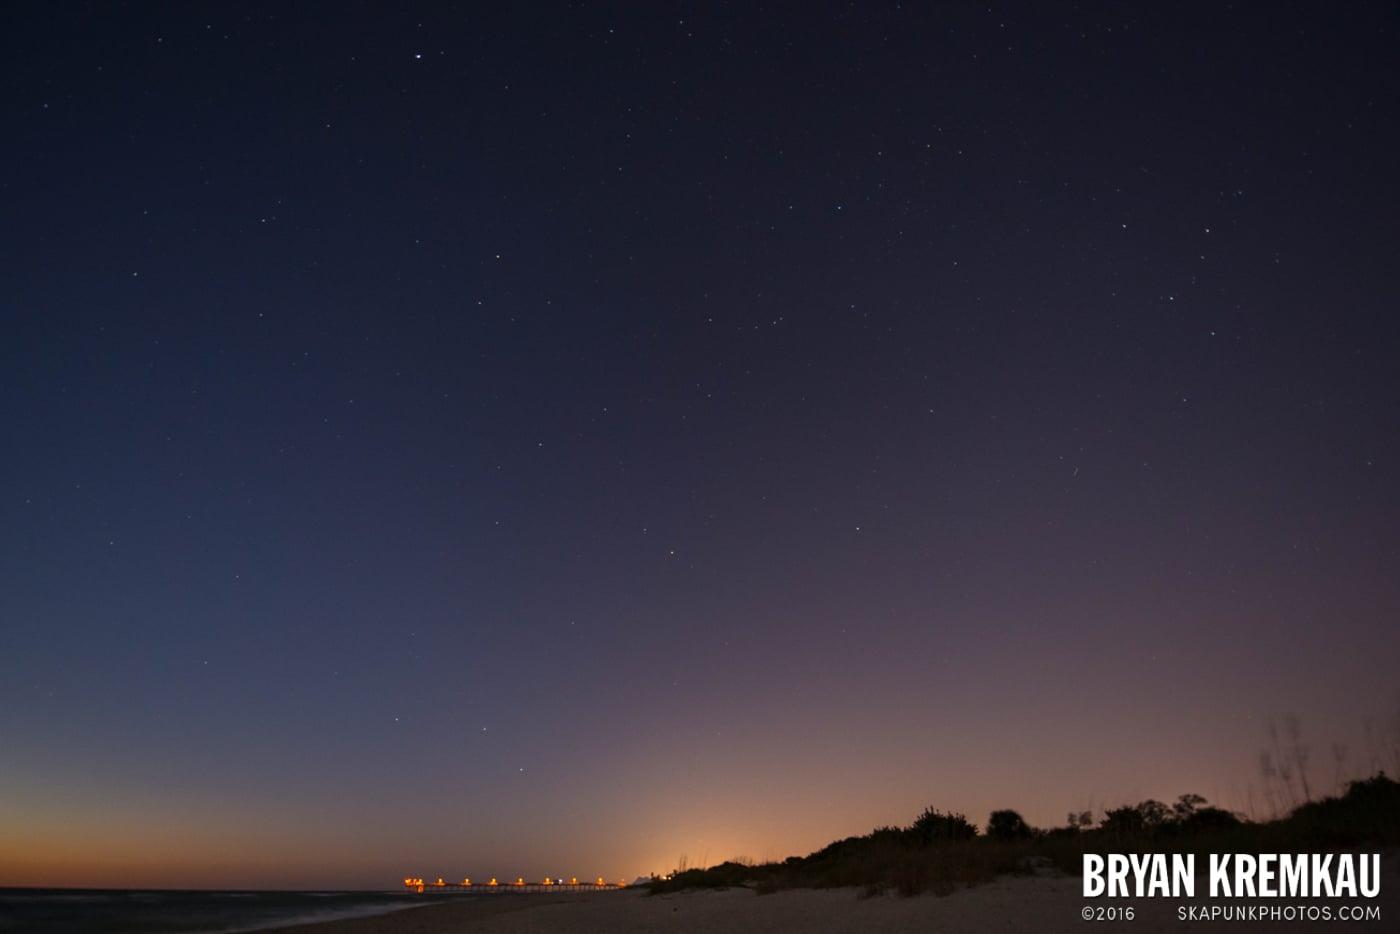 Sunsets, Astrophotography & Birds @ Venice, Florida - 10.25.14 - 11.5.14 (84)